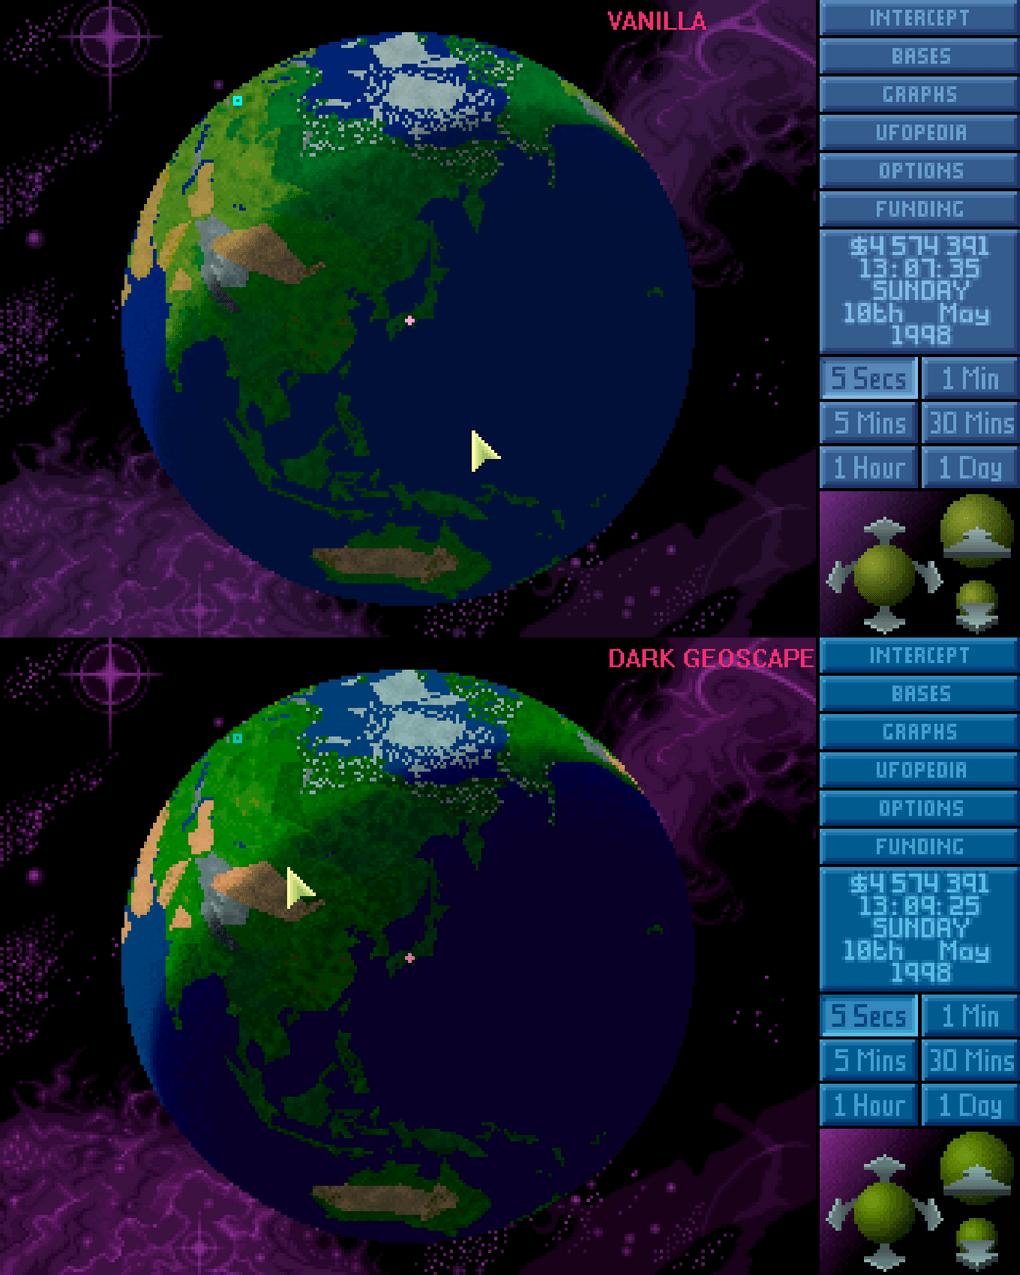 geo_dg_comparison_labeled.1.png